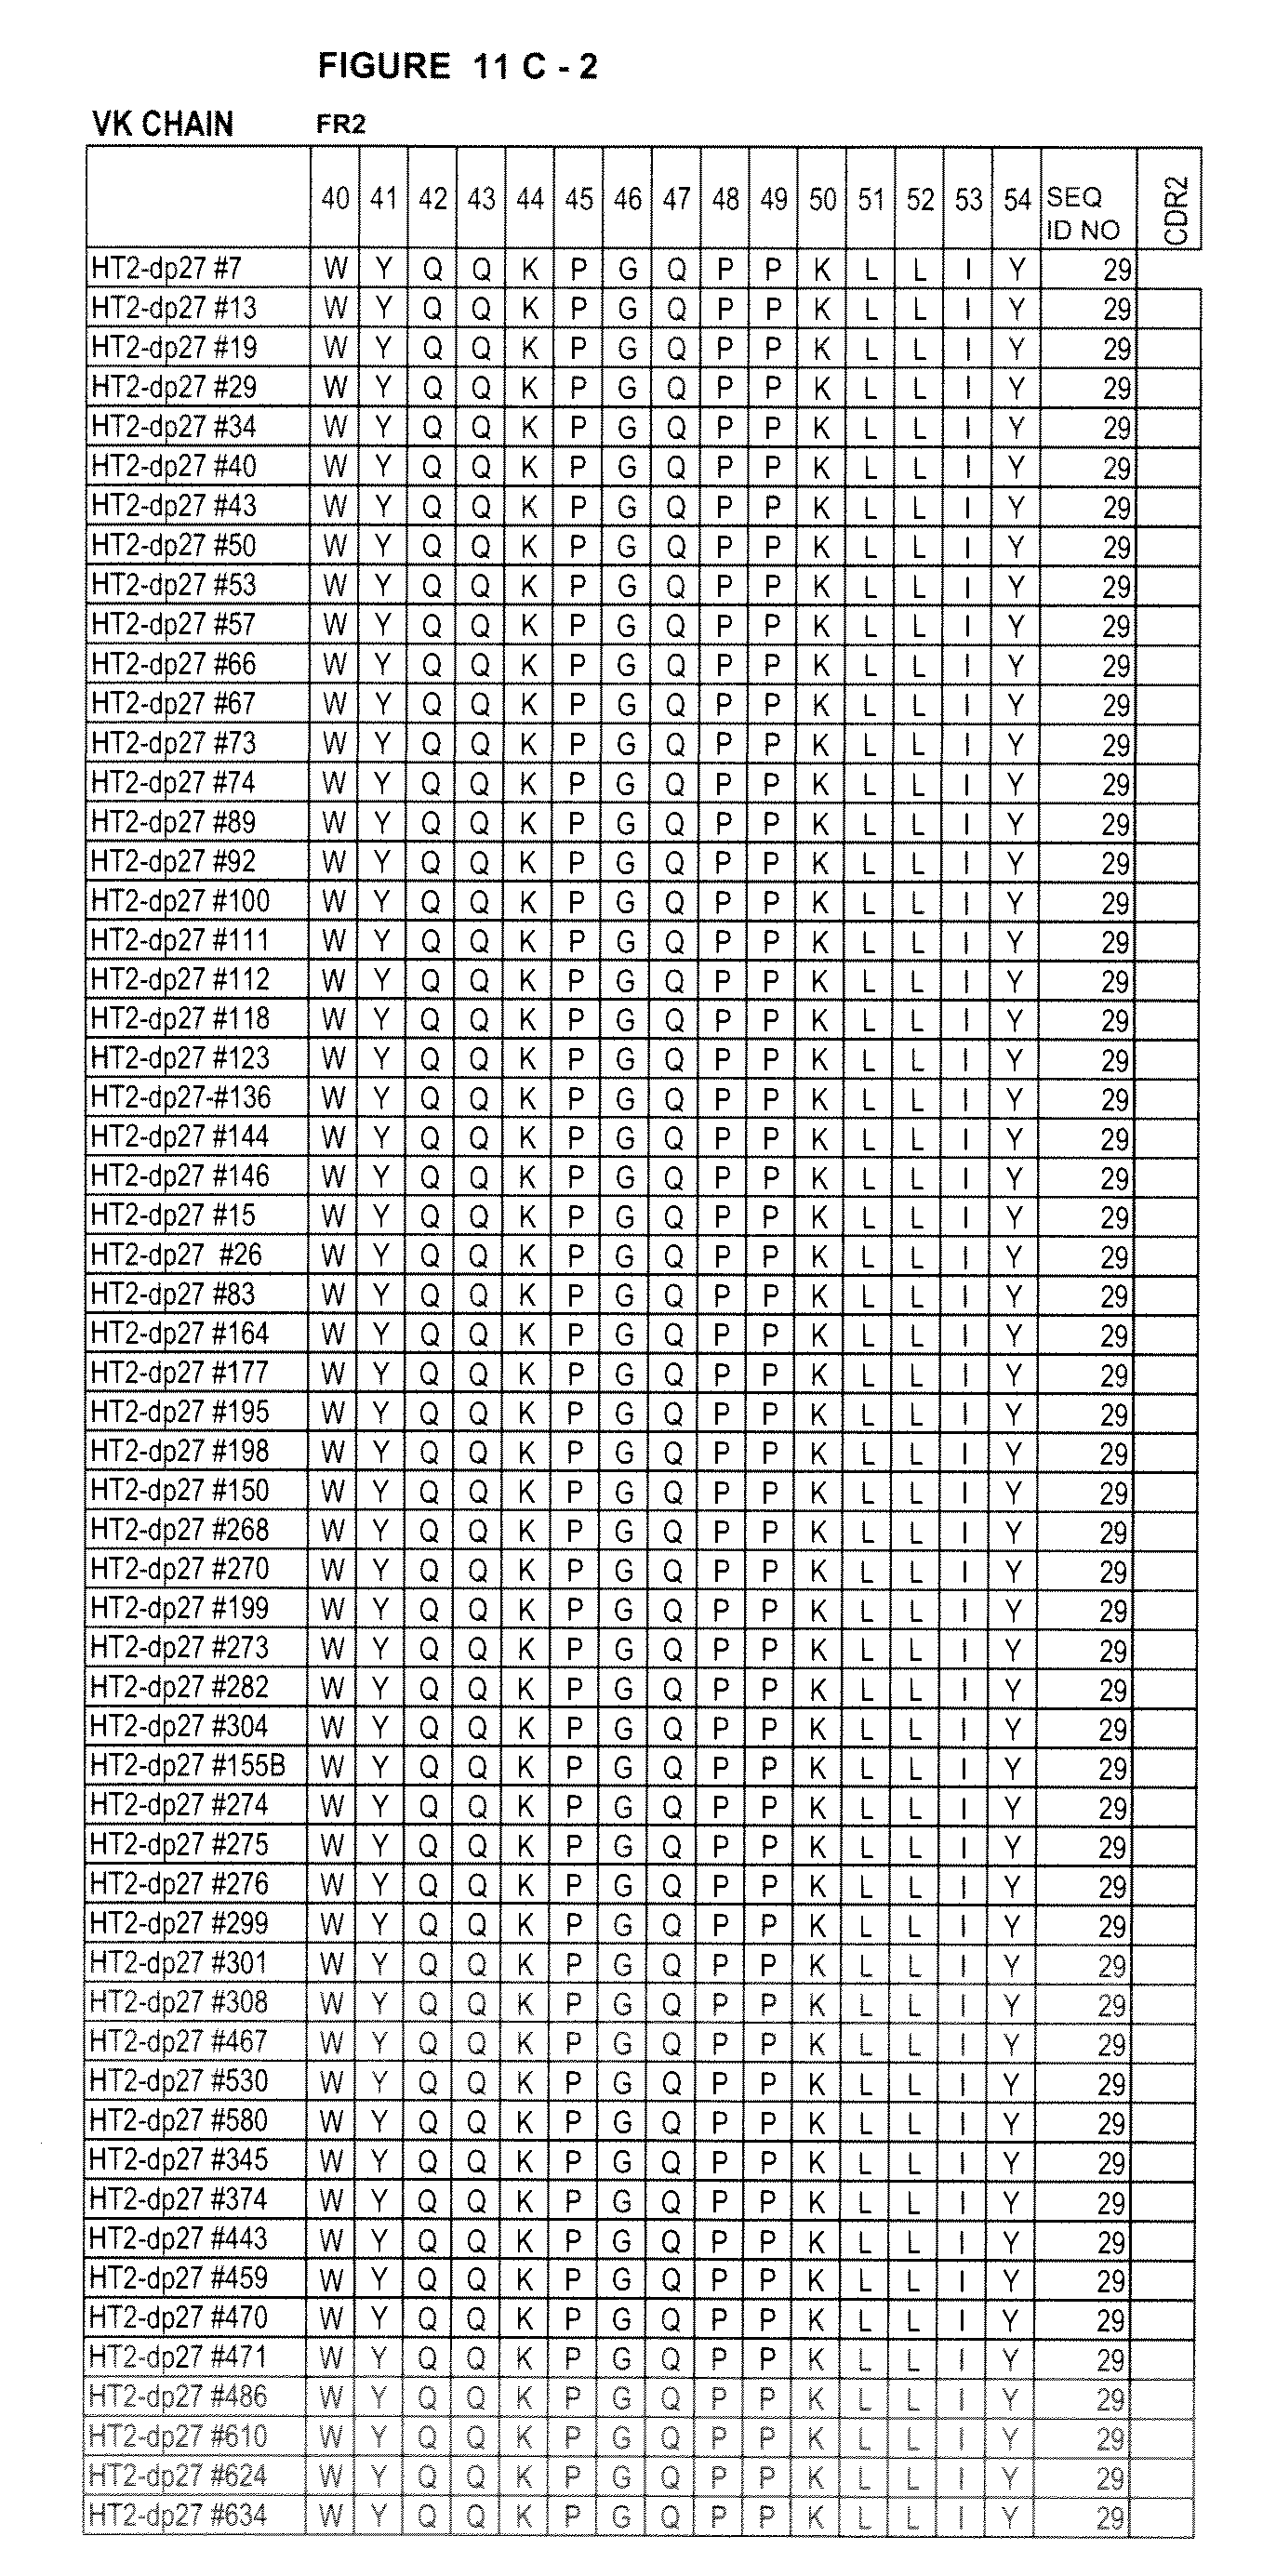 US9067994B2 - Anti-IL13 antibodies and uses thereof - Google